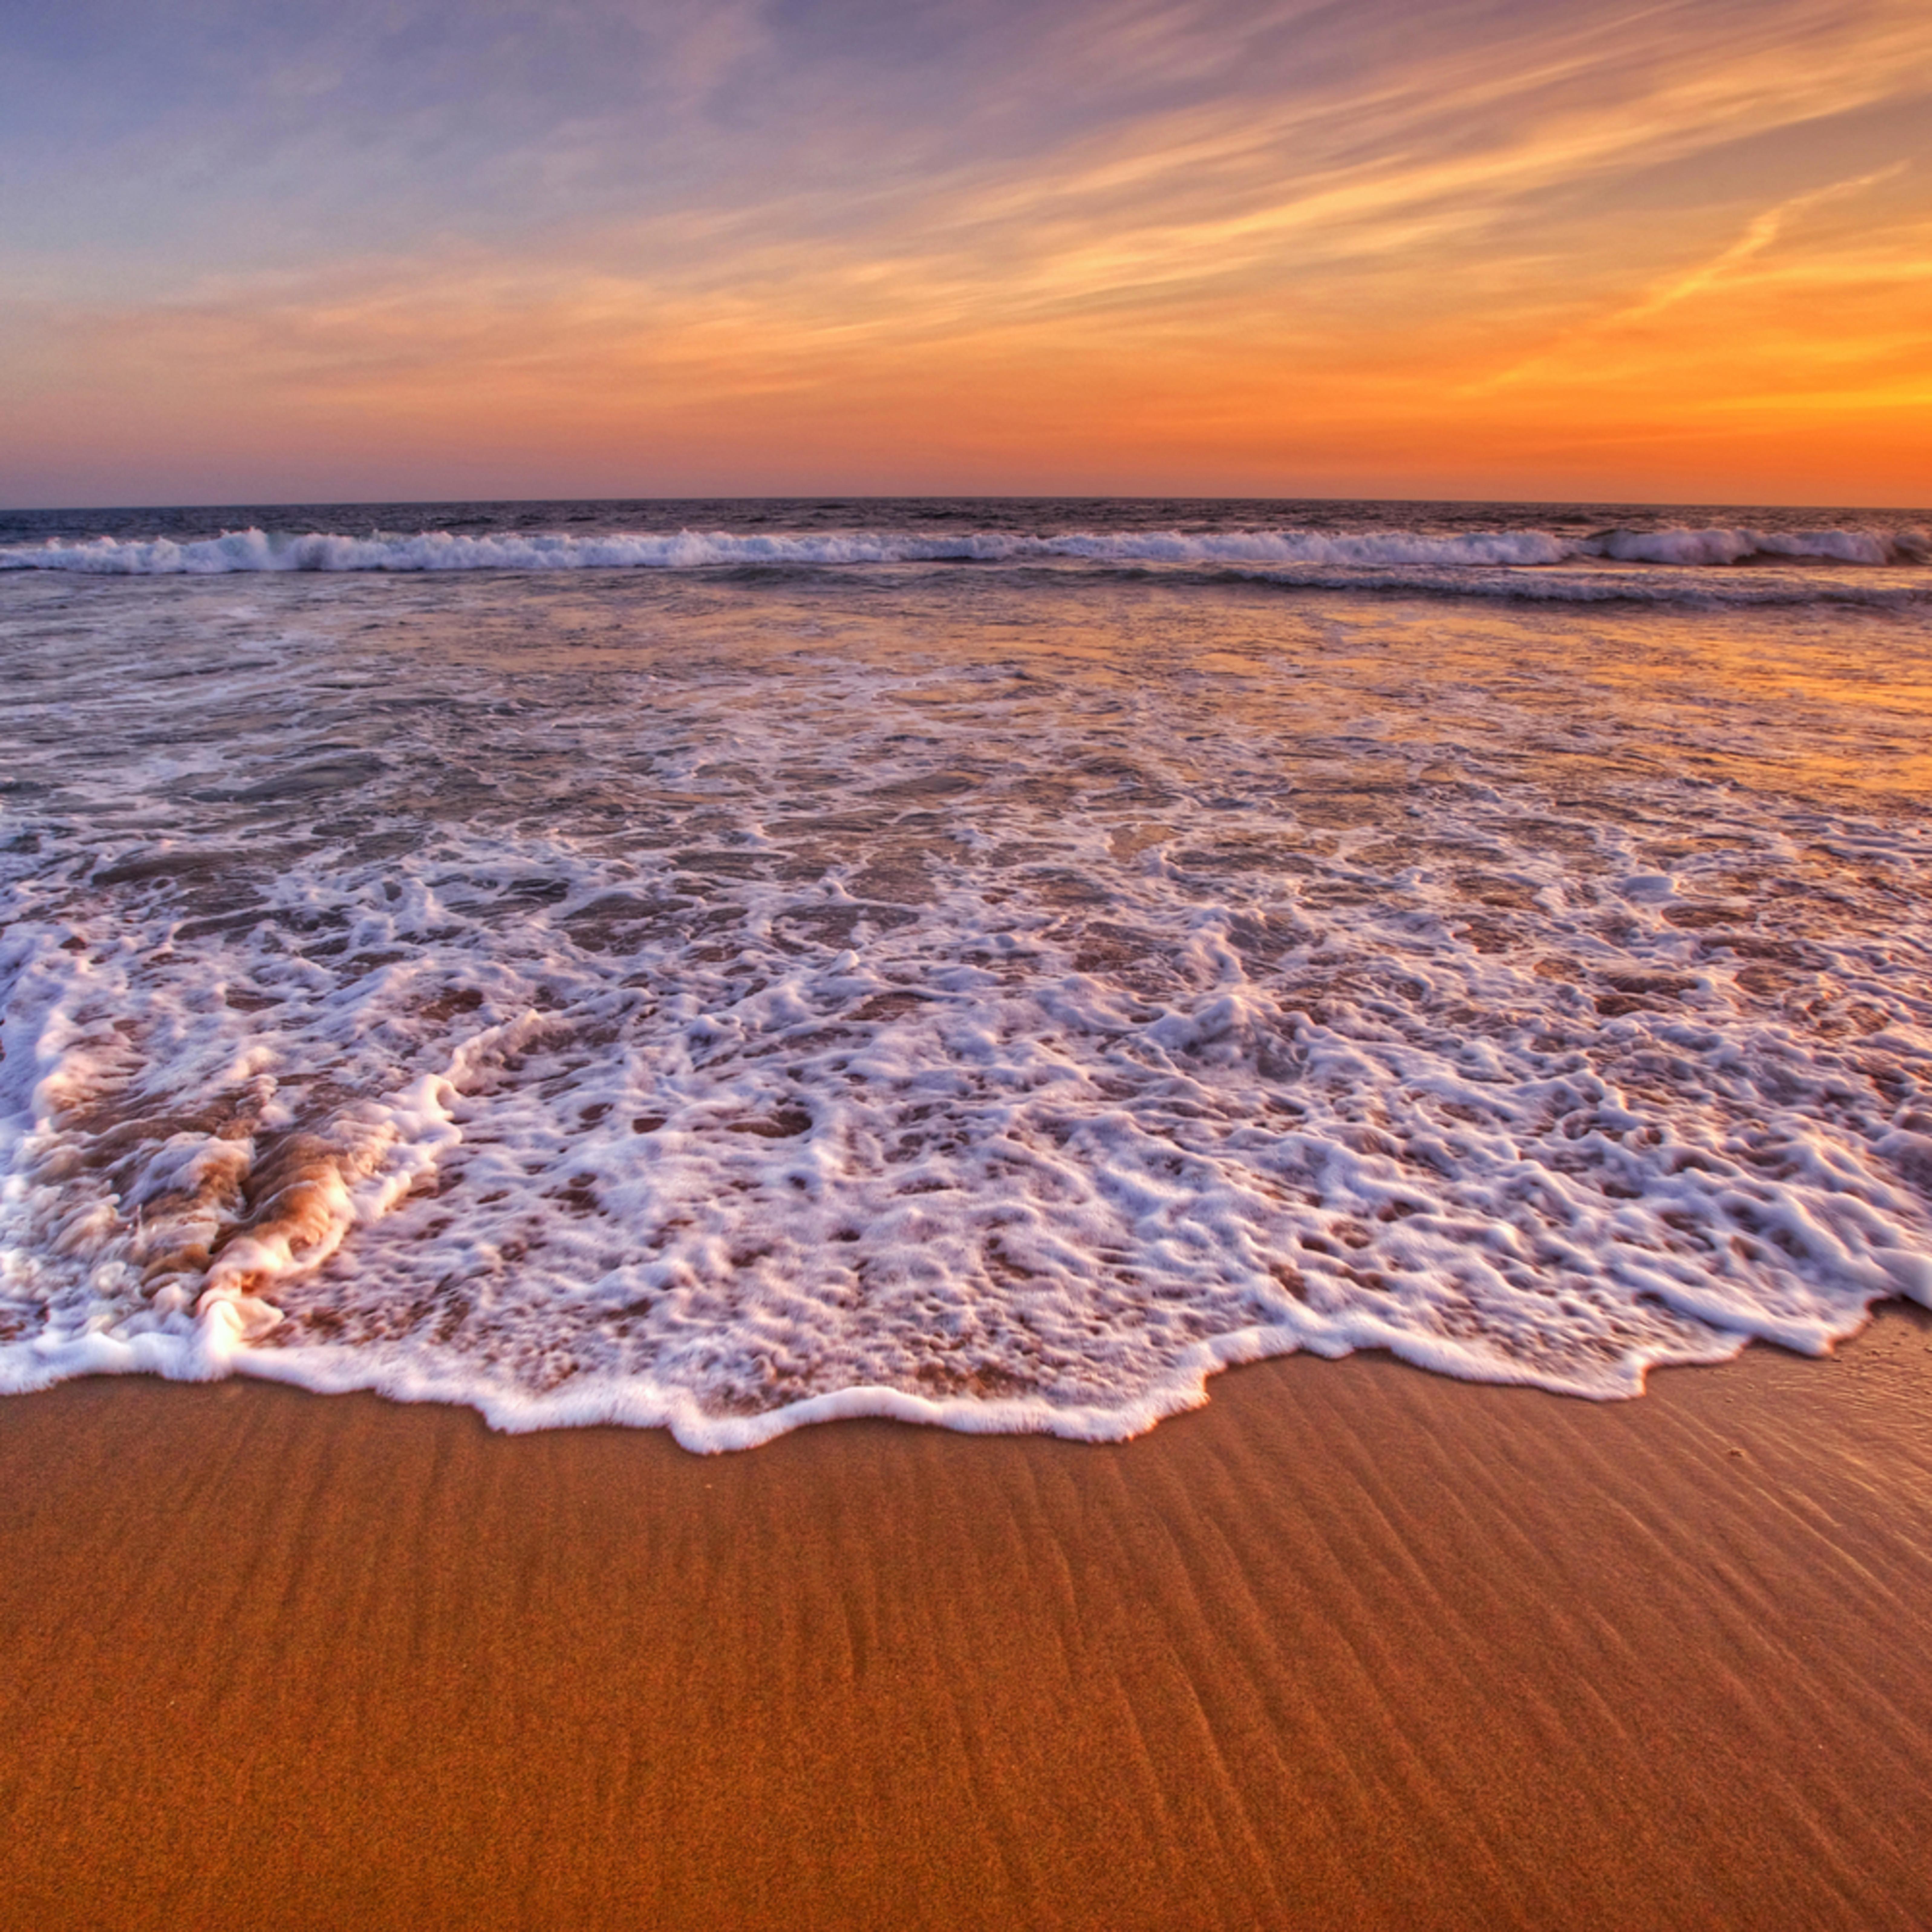 Huntington beach whitewash sunset california pd0md2